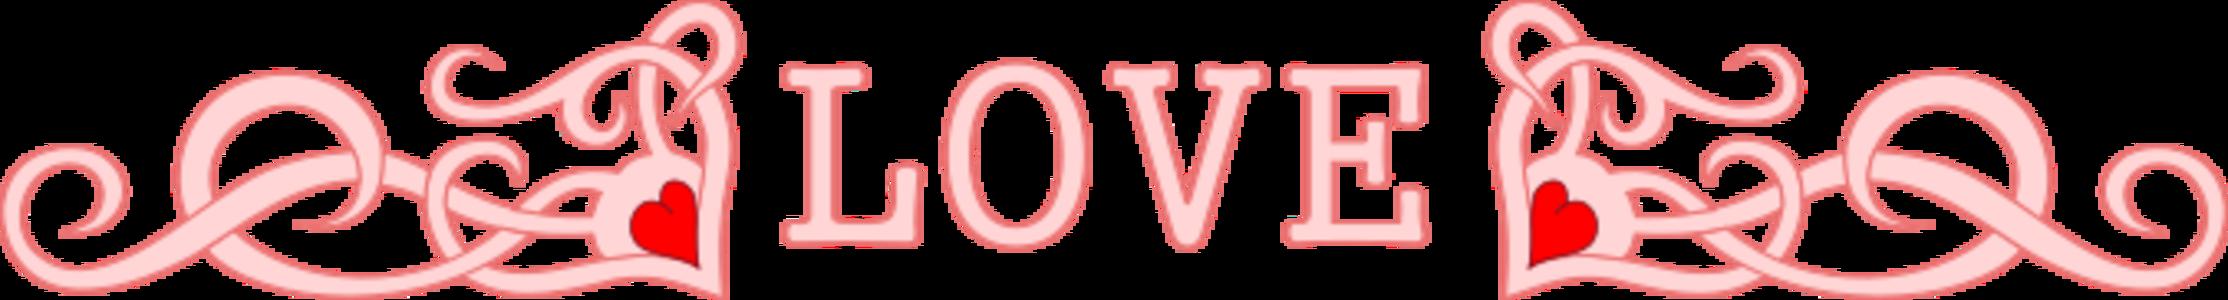 clip art clipart image svg openclipart 爱情 colour sign symbol ornament valentine man women heart holiday pink celebration february 14 valentinus feast of saint valentine 剪贴画 符号 标志 装饰 男人 假日 节日 假期 彩色 情人节 庆祝 心形 心脏 粉红 粉红色